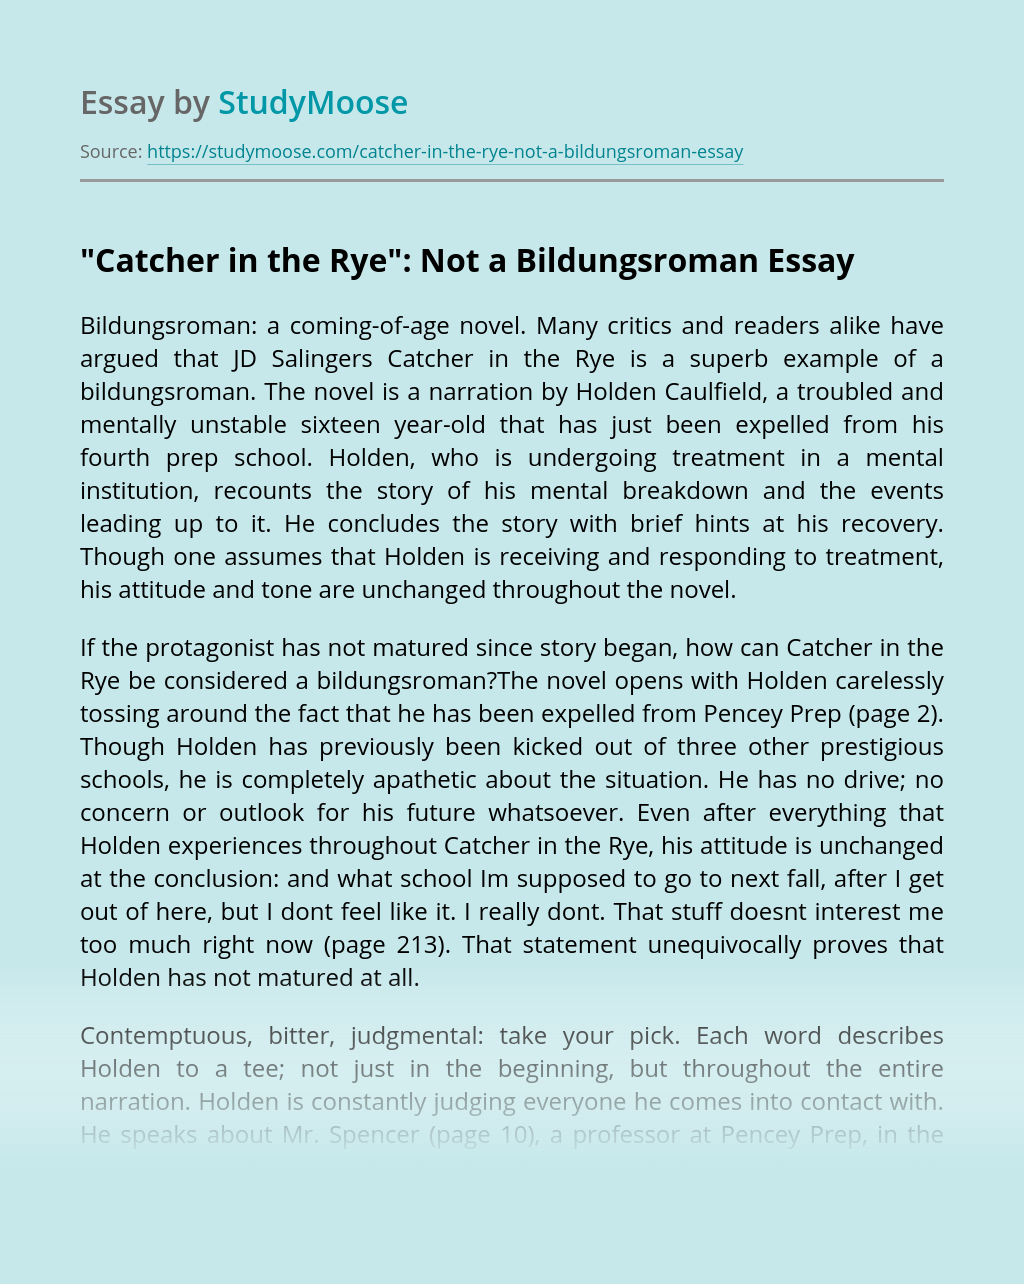 """Catcher in the Rye"": Not a Bildungsroman"